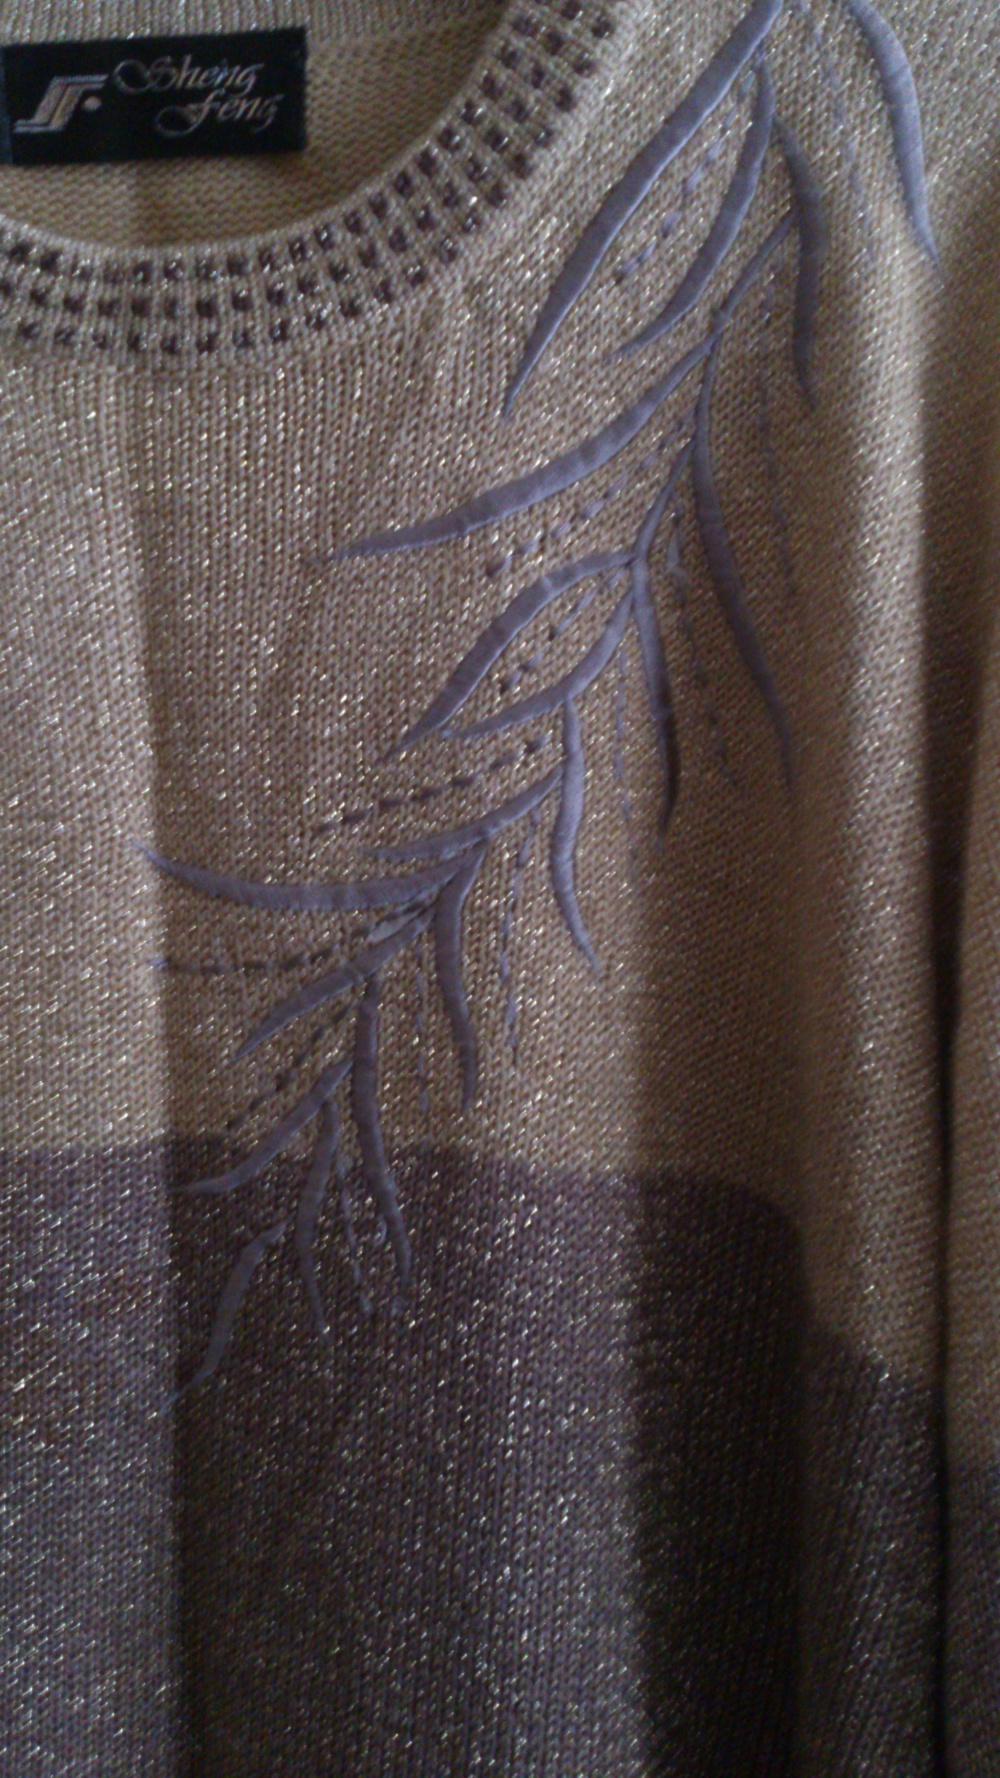 Кофта = туника Sheng feng, размер 50-56, Турция